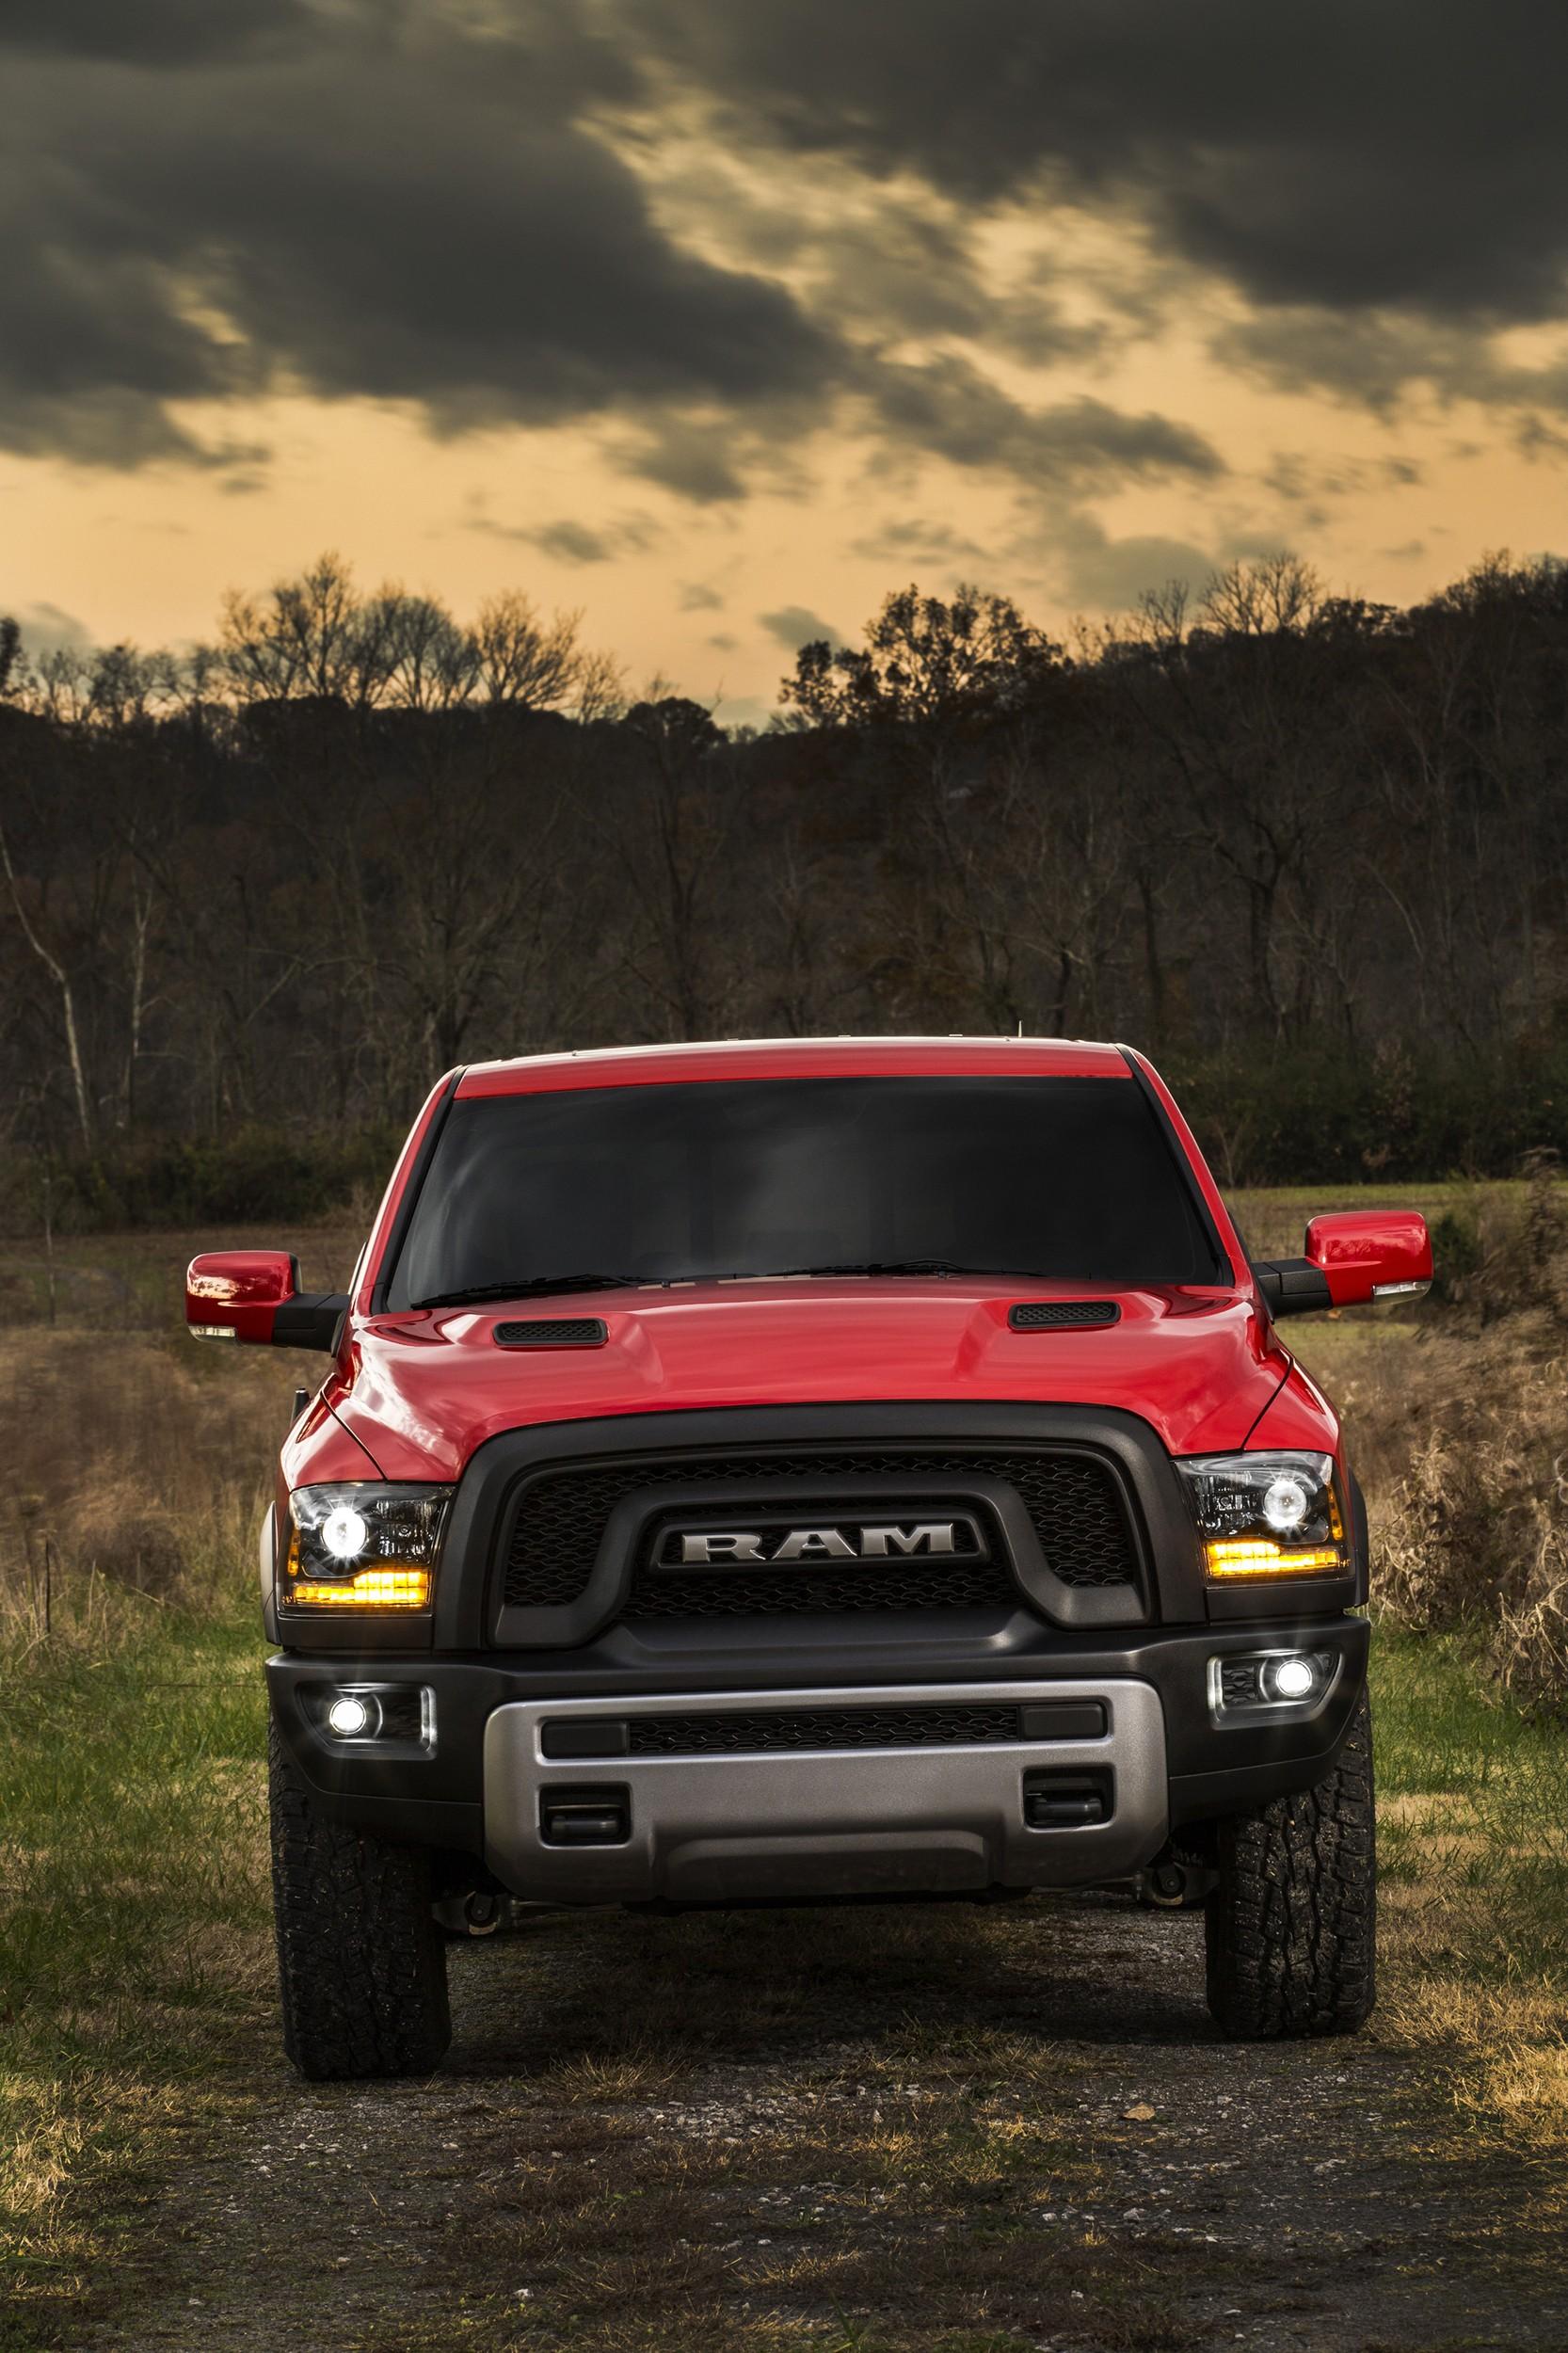 Dodge Pickup Trucks >> 2016 Ram Heavy-Duty Pickup Truck Detailed - autoevolution